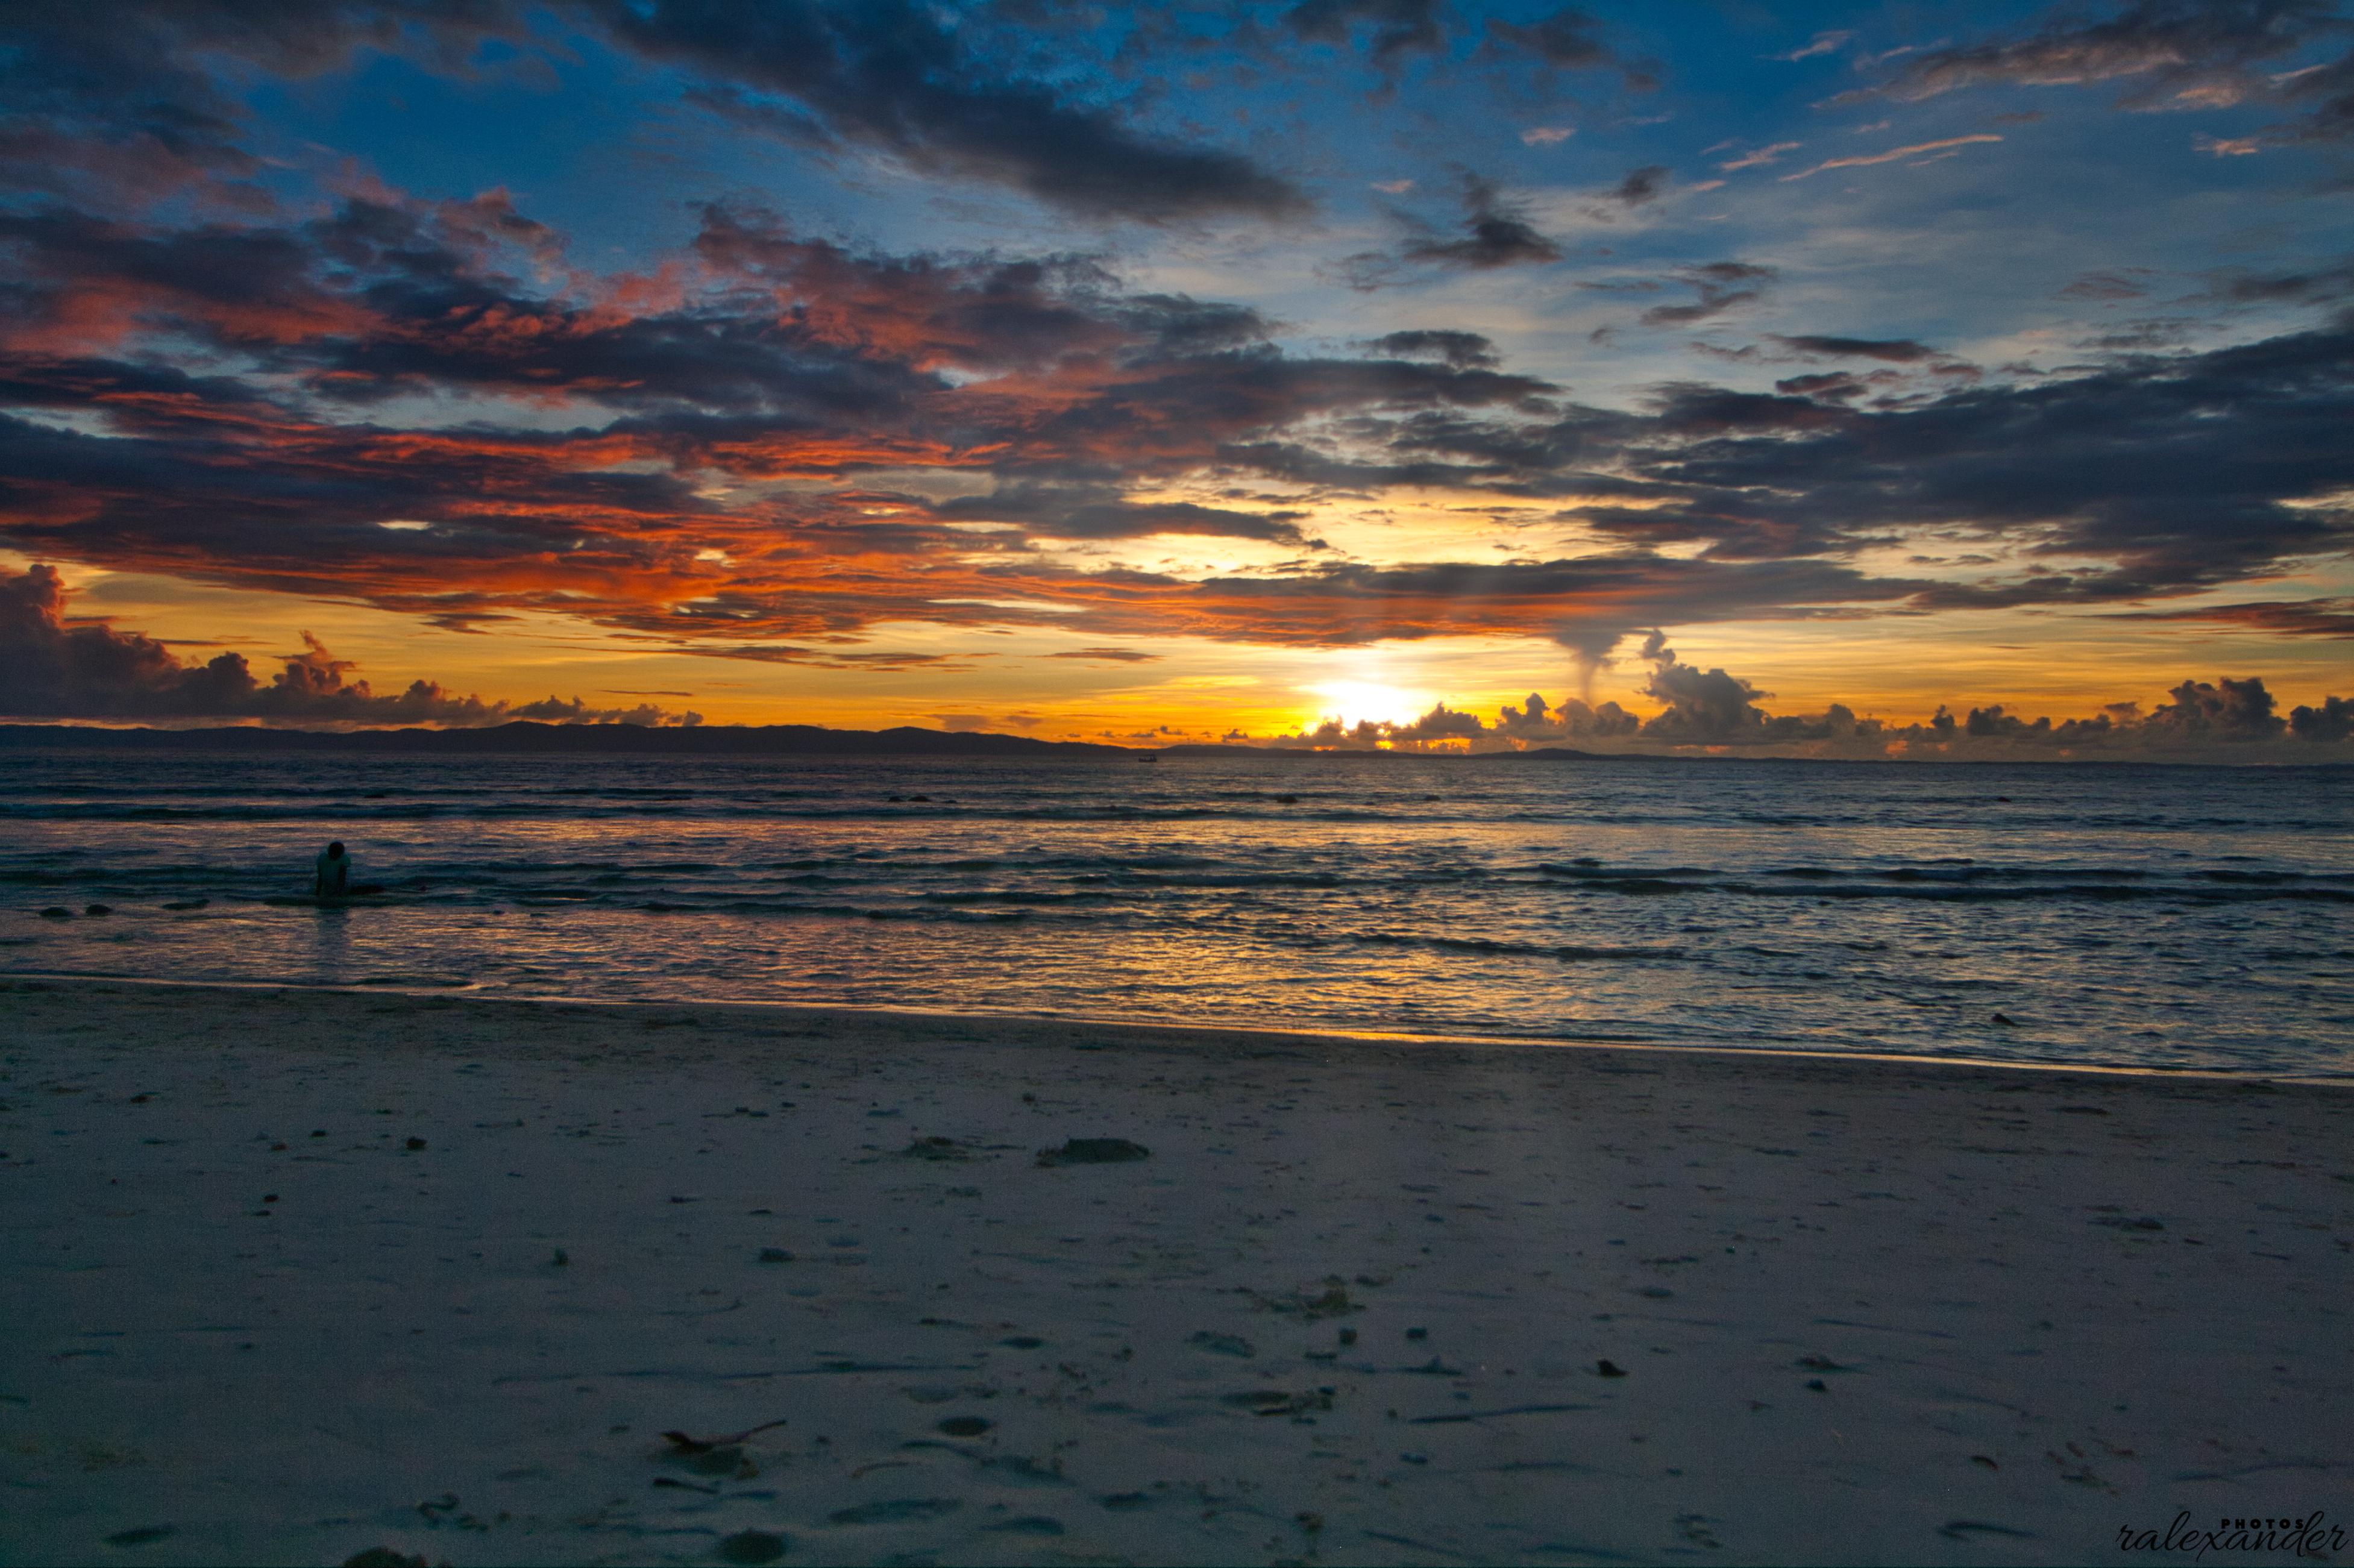 Sunset at lakshmanpur beach photo